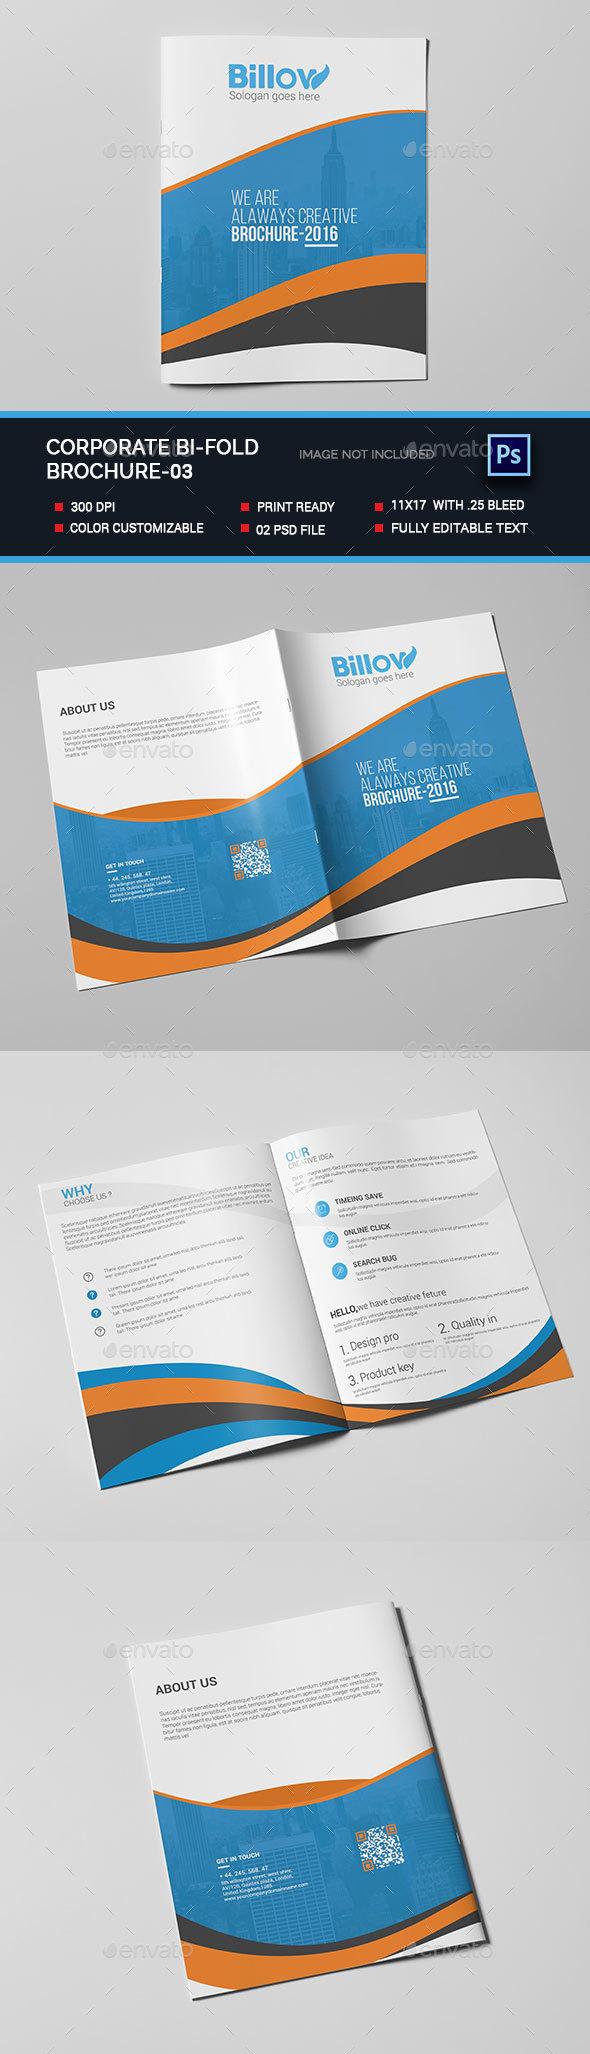 Corporate Bi-fold Brochure-03 - Brochures Print Templates